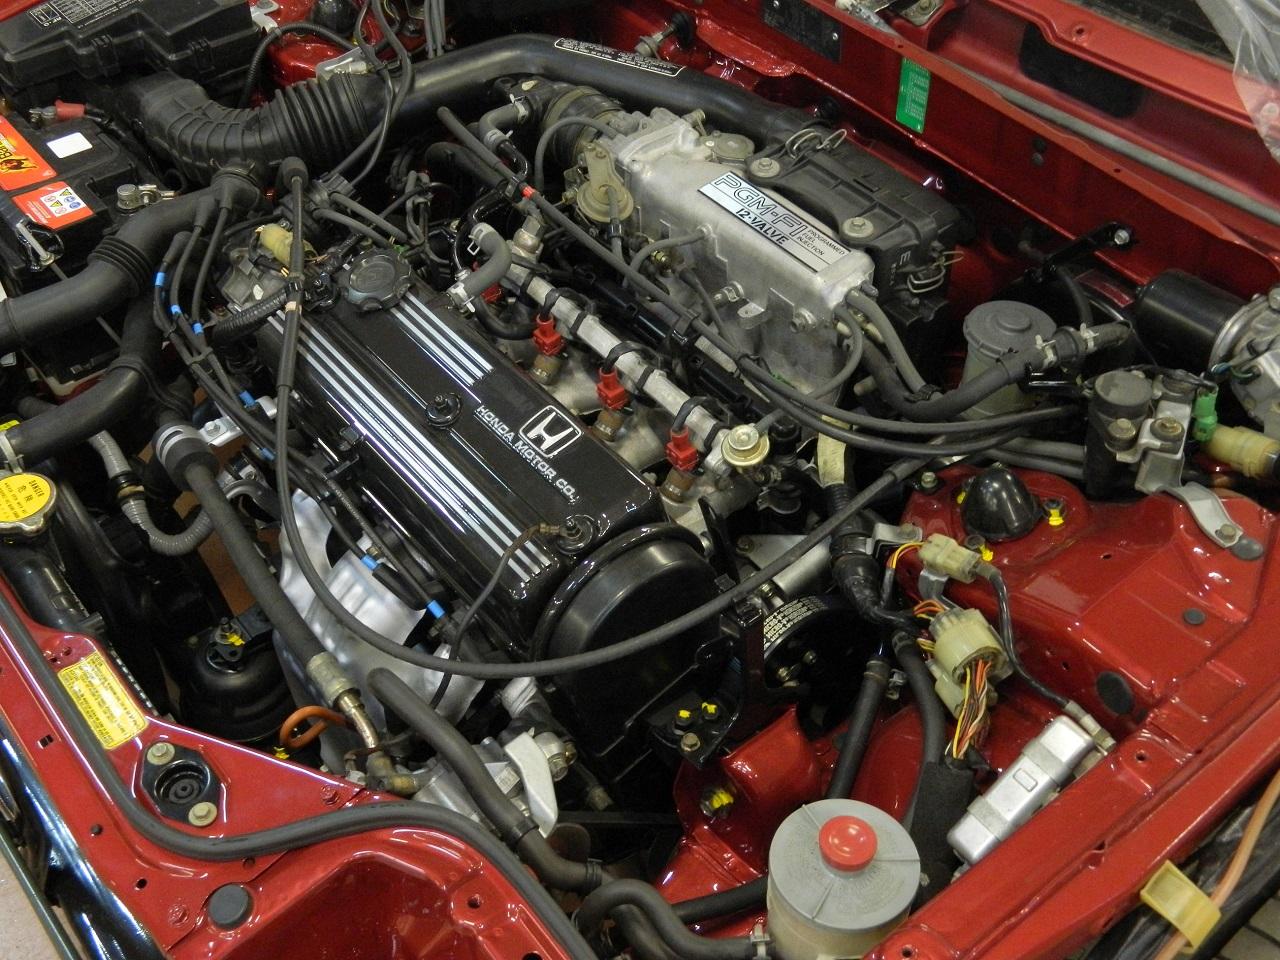 [Image: 1_Honda_accord_moteur_hd.JPG]